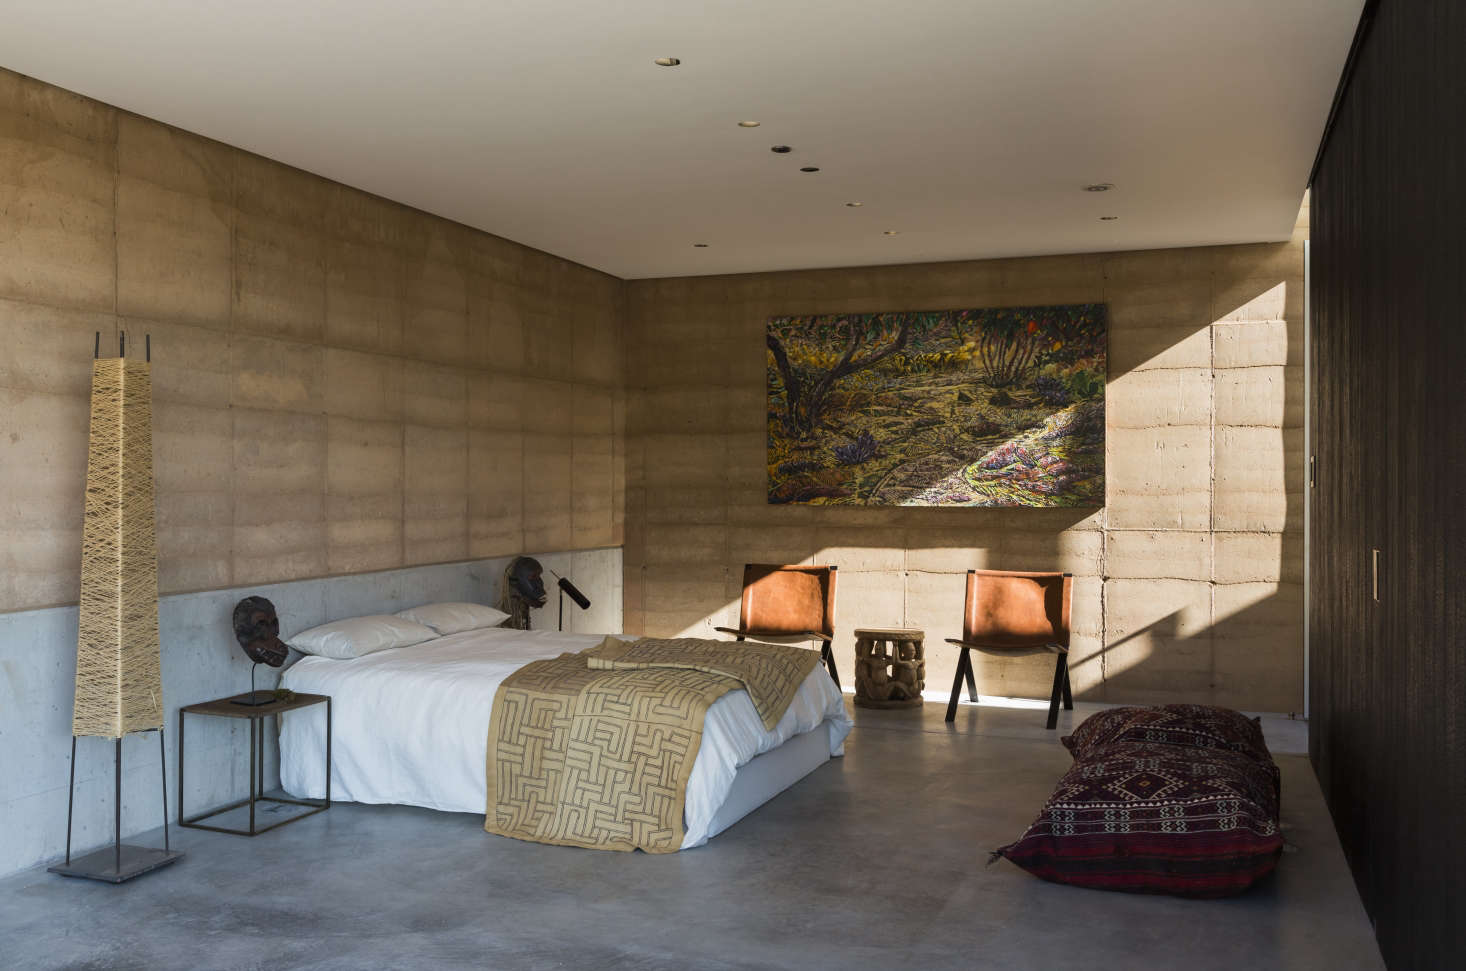 Steal This Look: Sonoran-Style Bedroom/Living Room in Tucson, Arizona